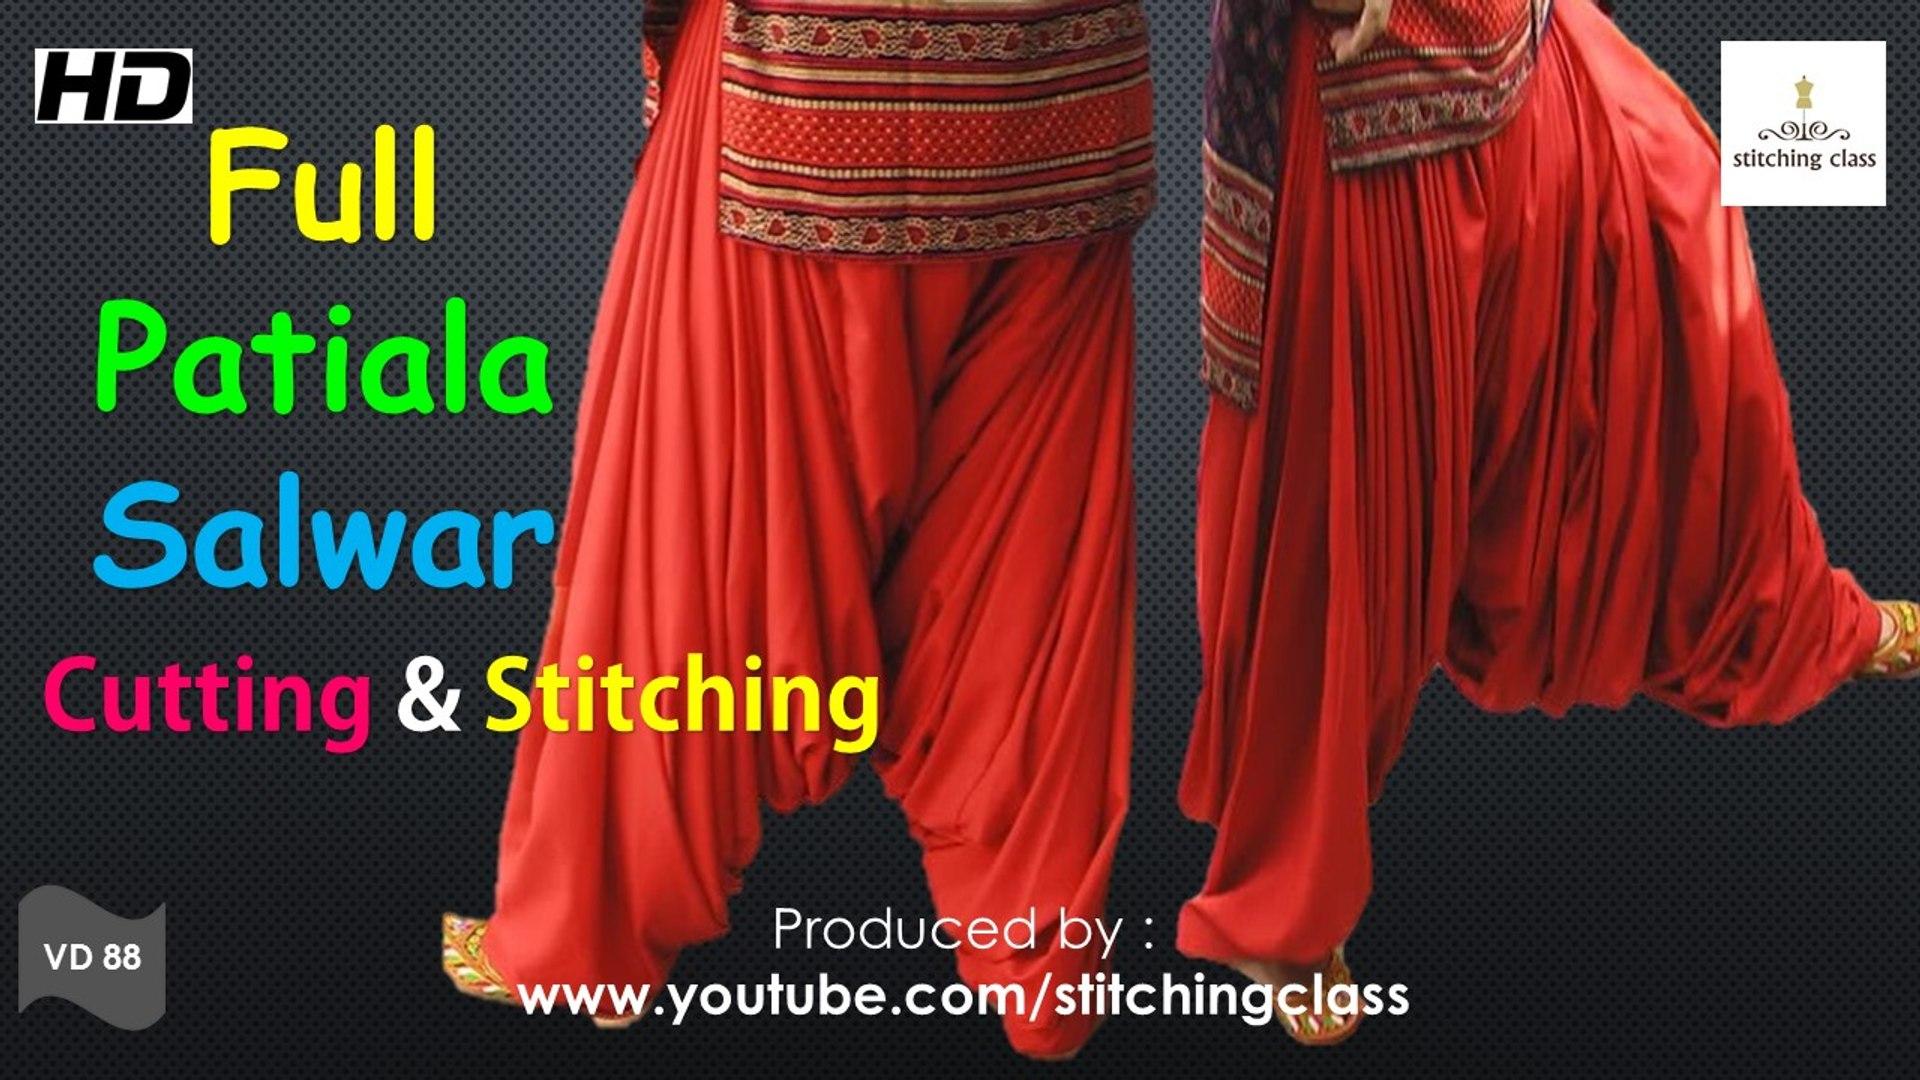 Full Patiala Salwar Cutting and Stitching